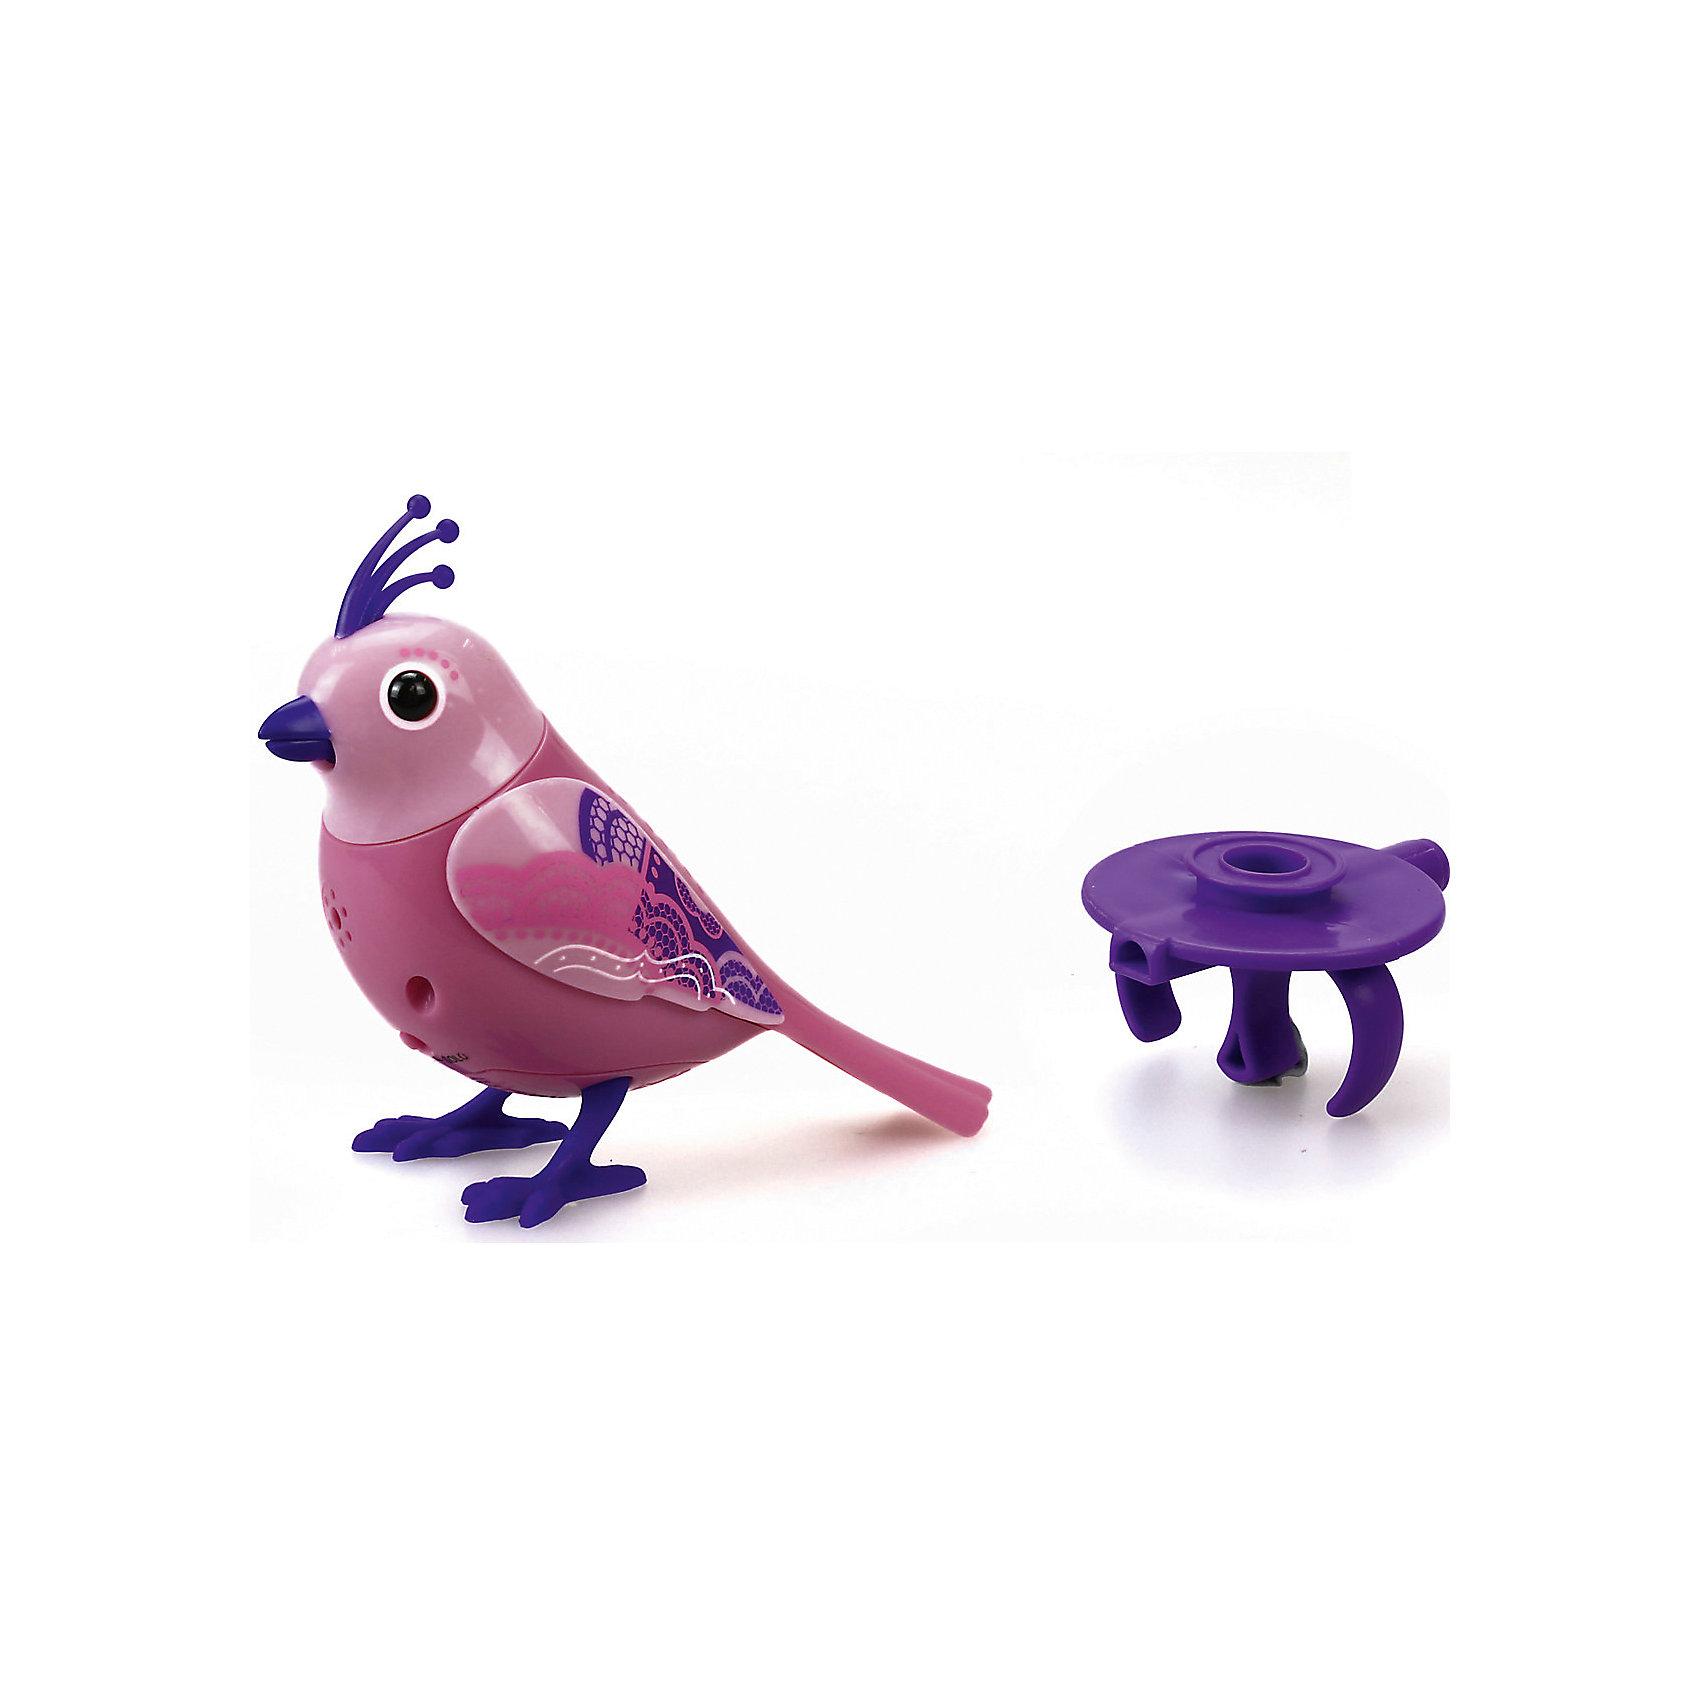 Поющая птичка с кольцом, фиолетово-розовая, DigiBirds<br><br>Ширина мм: 64<br>Глубина мм: 152<br>Высота мм: 102<br>Вес г: 91<br>Возраст от месяцев: 36<br>Возраст до месяцев: 84<br>Пол: Женский<br>Возраст: Детский<br>SKU: 5419999